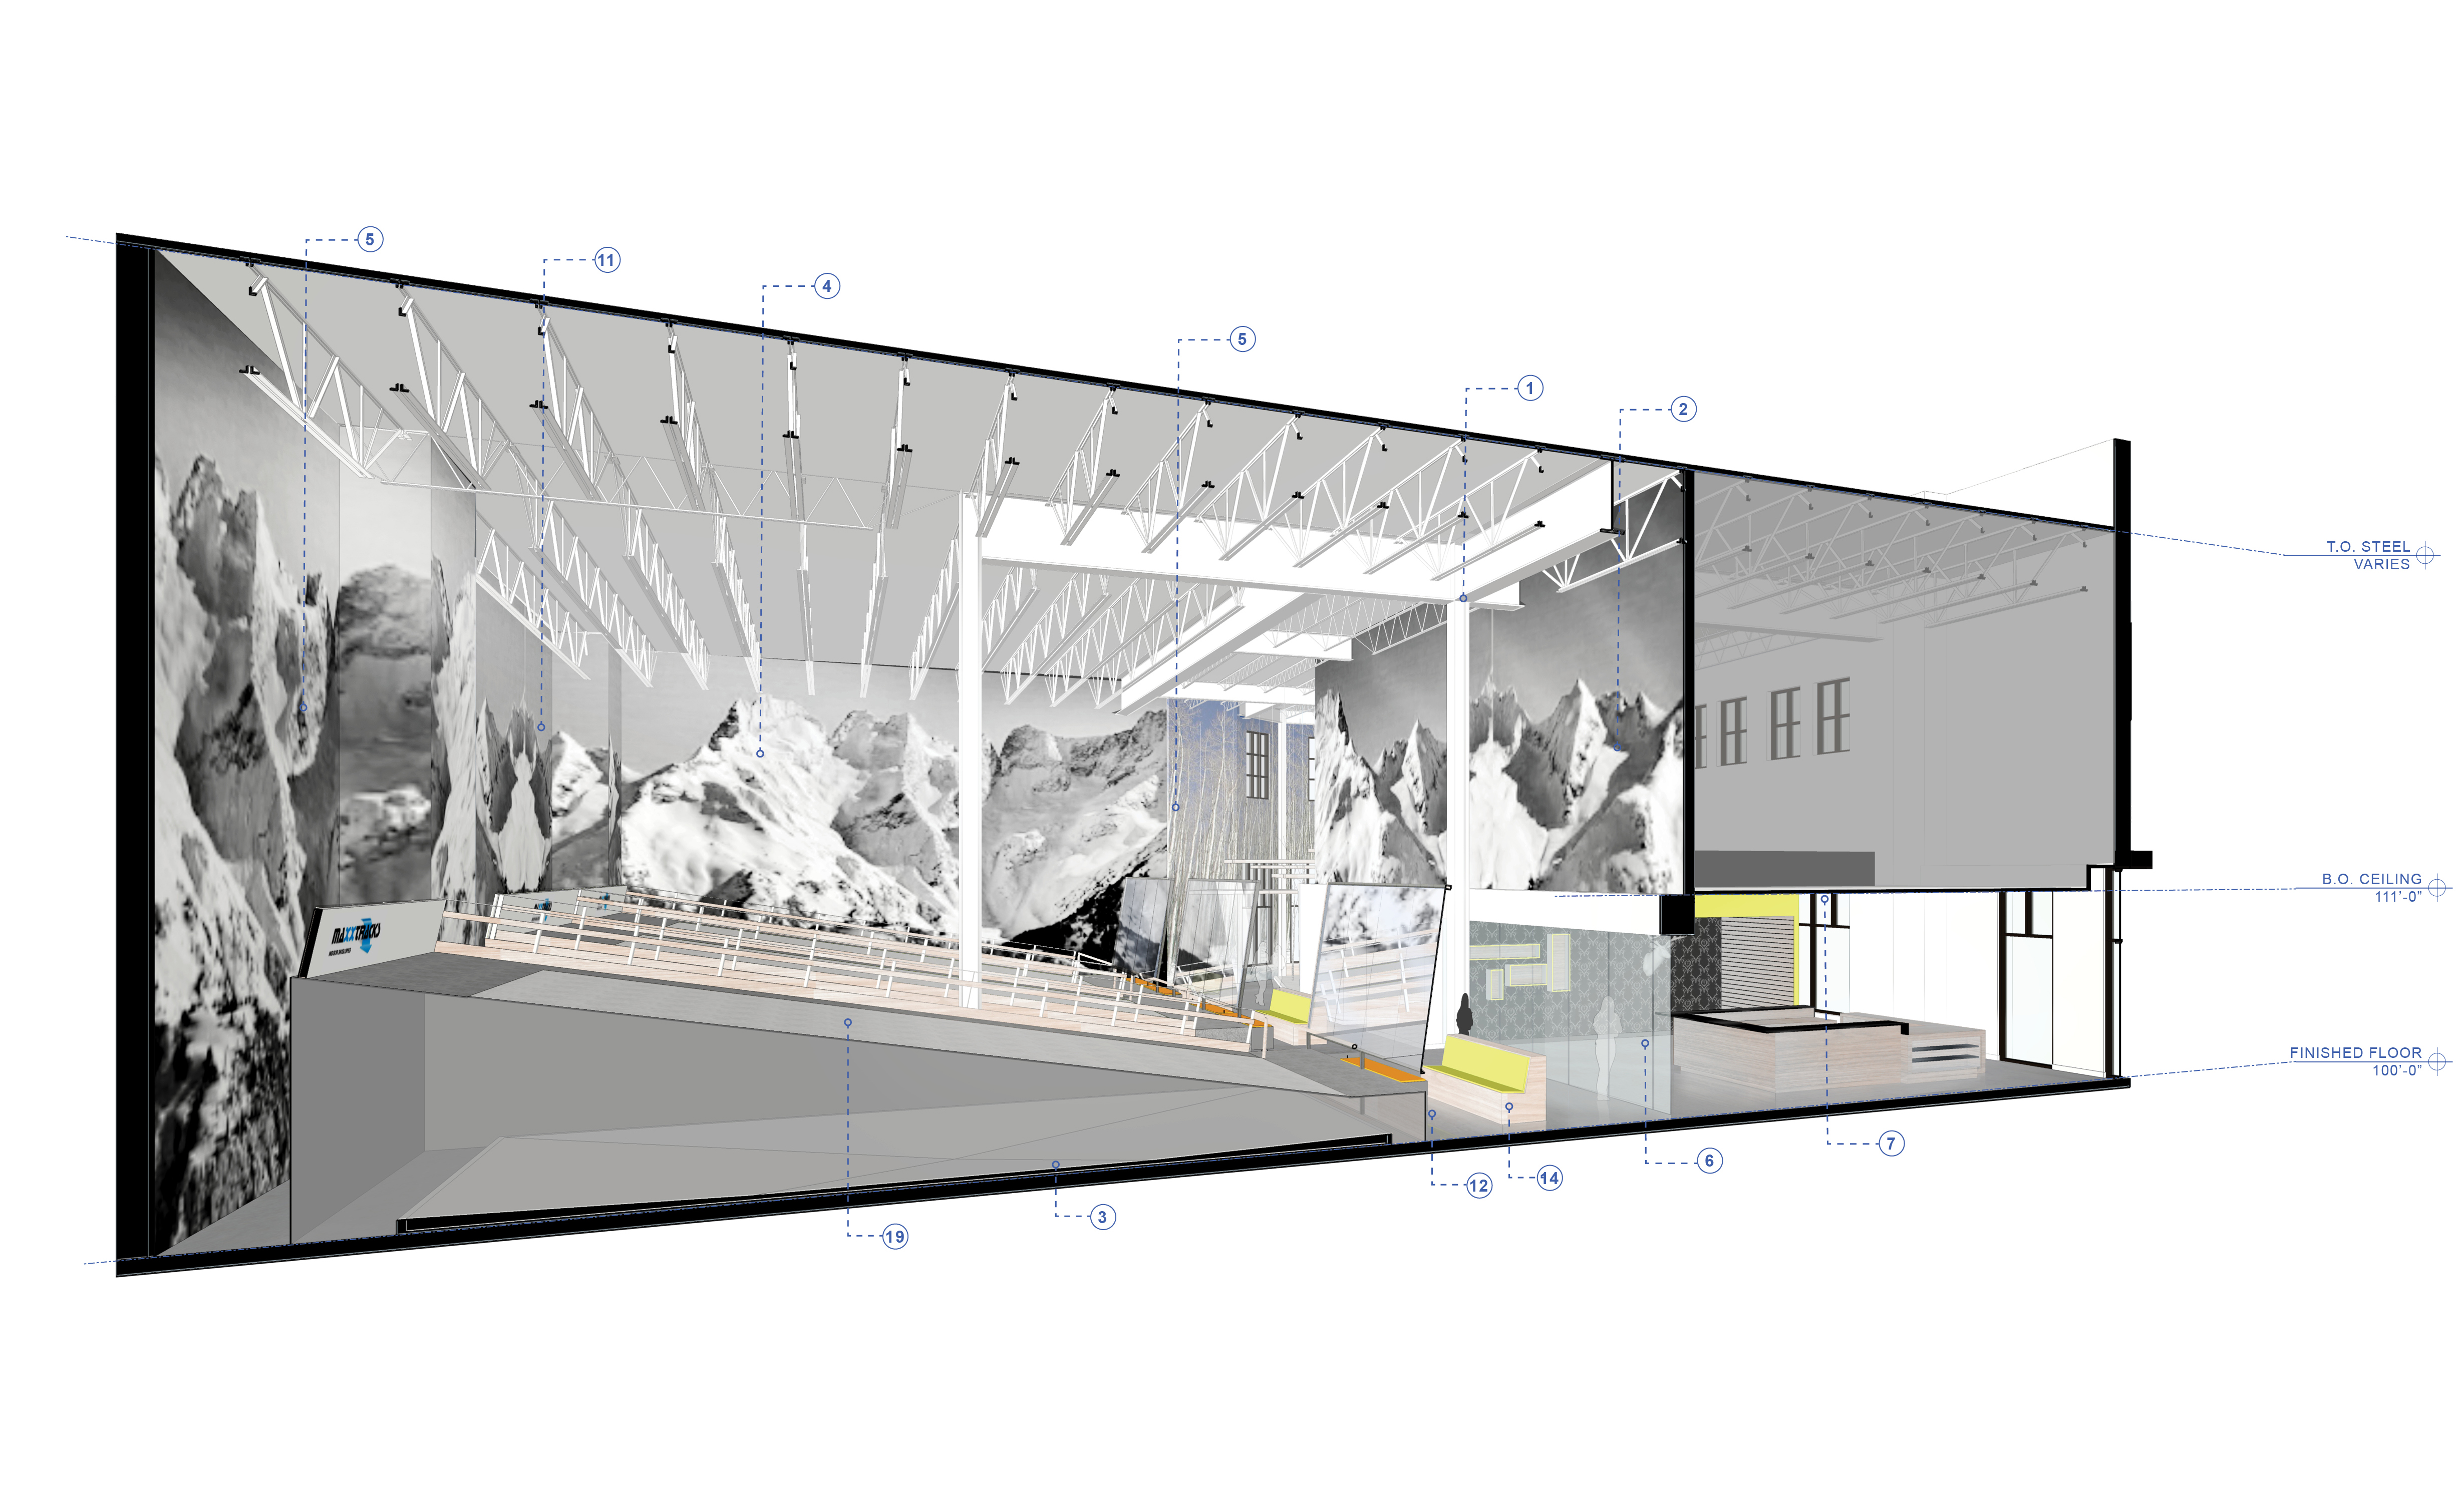 Snobahn ski + snowboard open studio architecture OSA indoor skiing building section